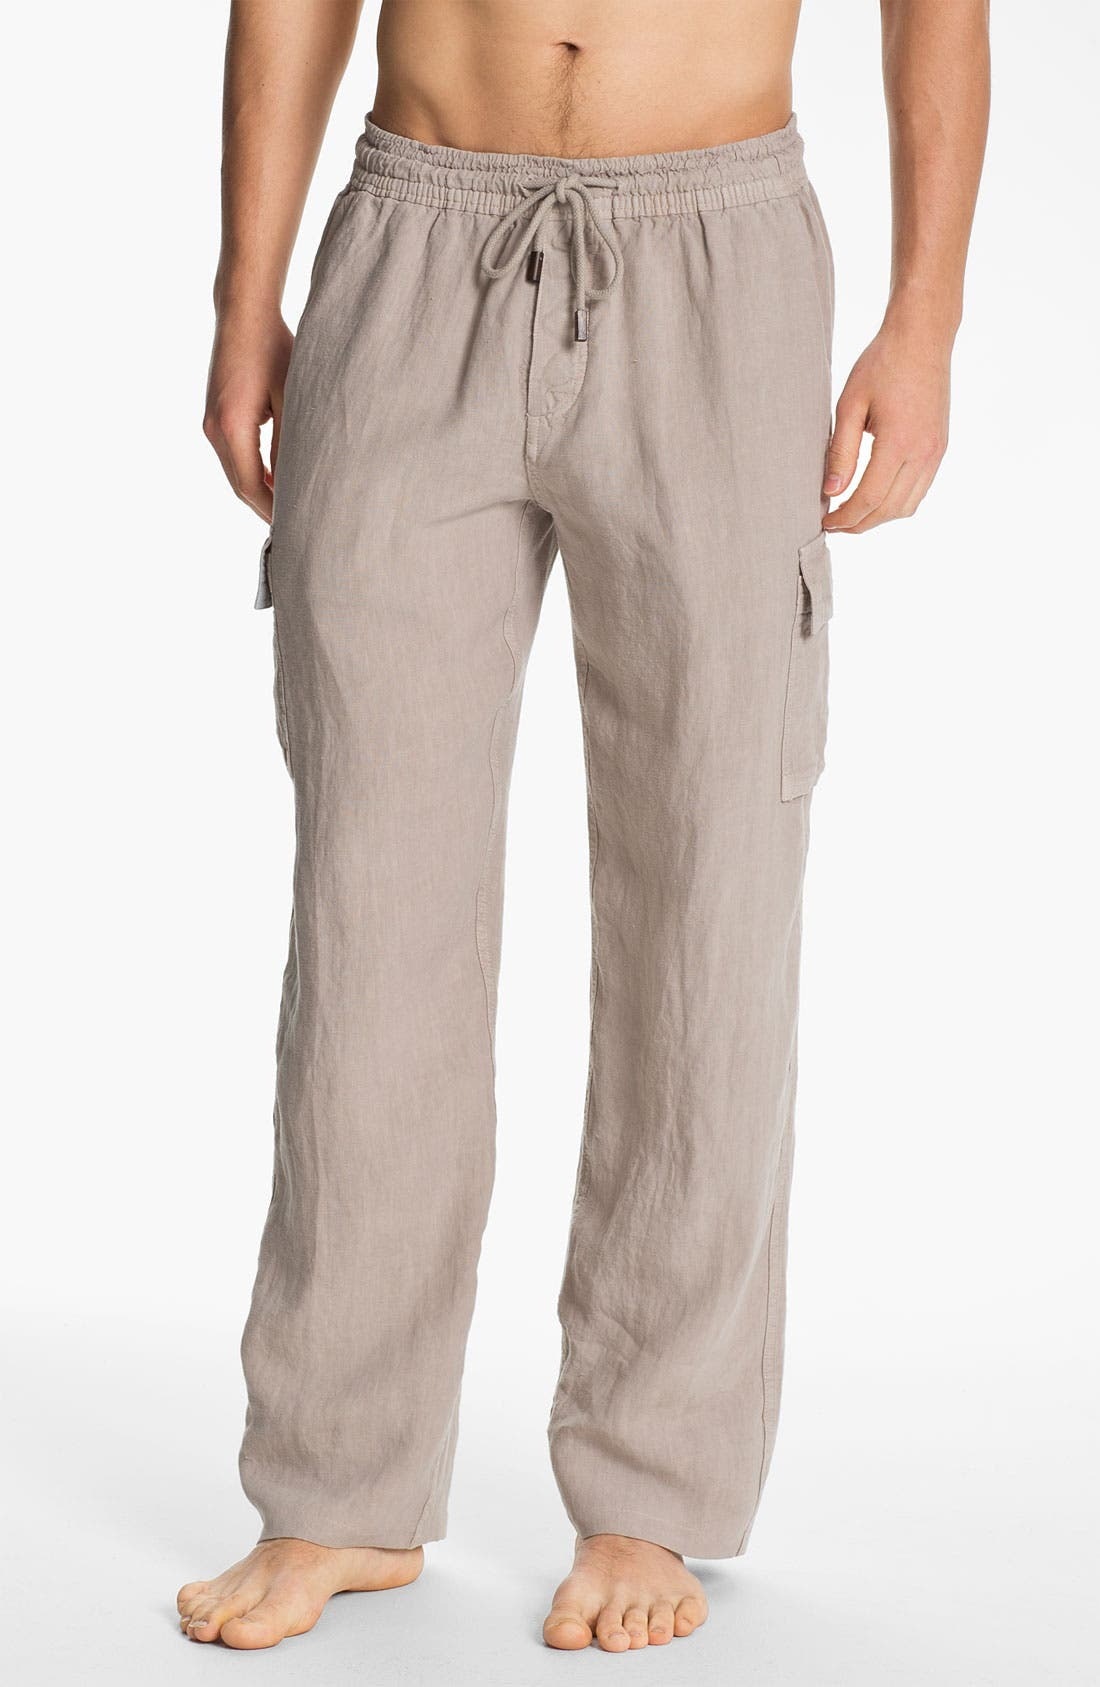 Alternate Image 1 Selected - Vilebrequin 'Ponant' Linen Cargo Pants